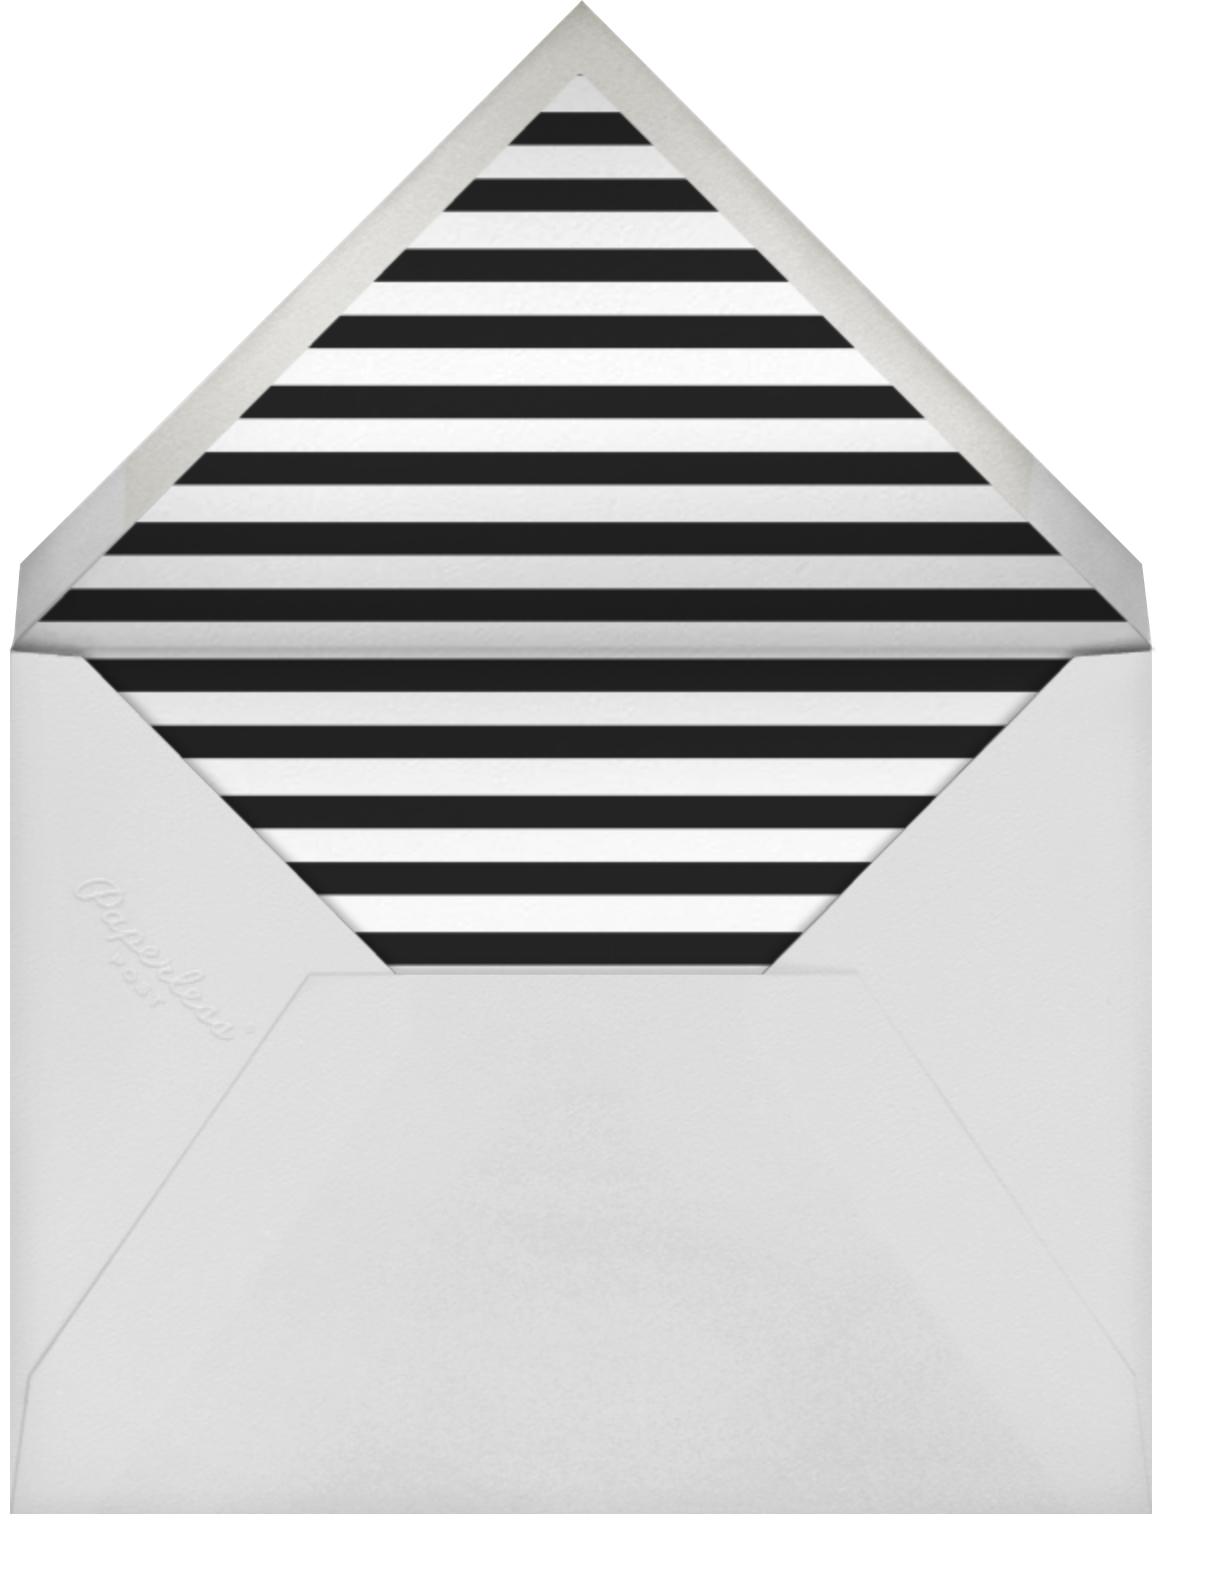 Transom (Tall Announcement) - White - Paperless Post - Envelope